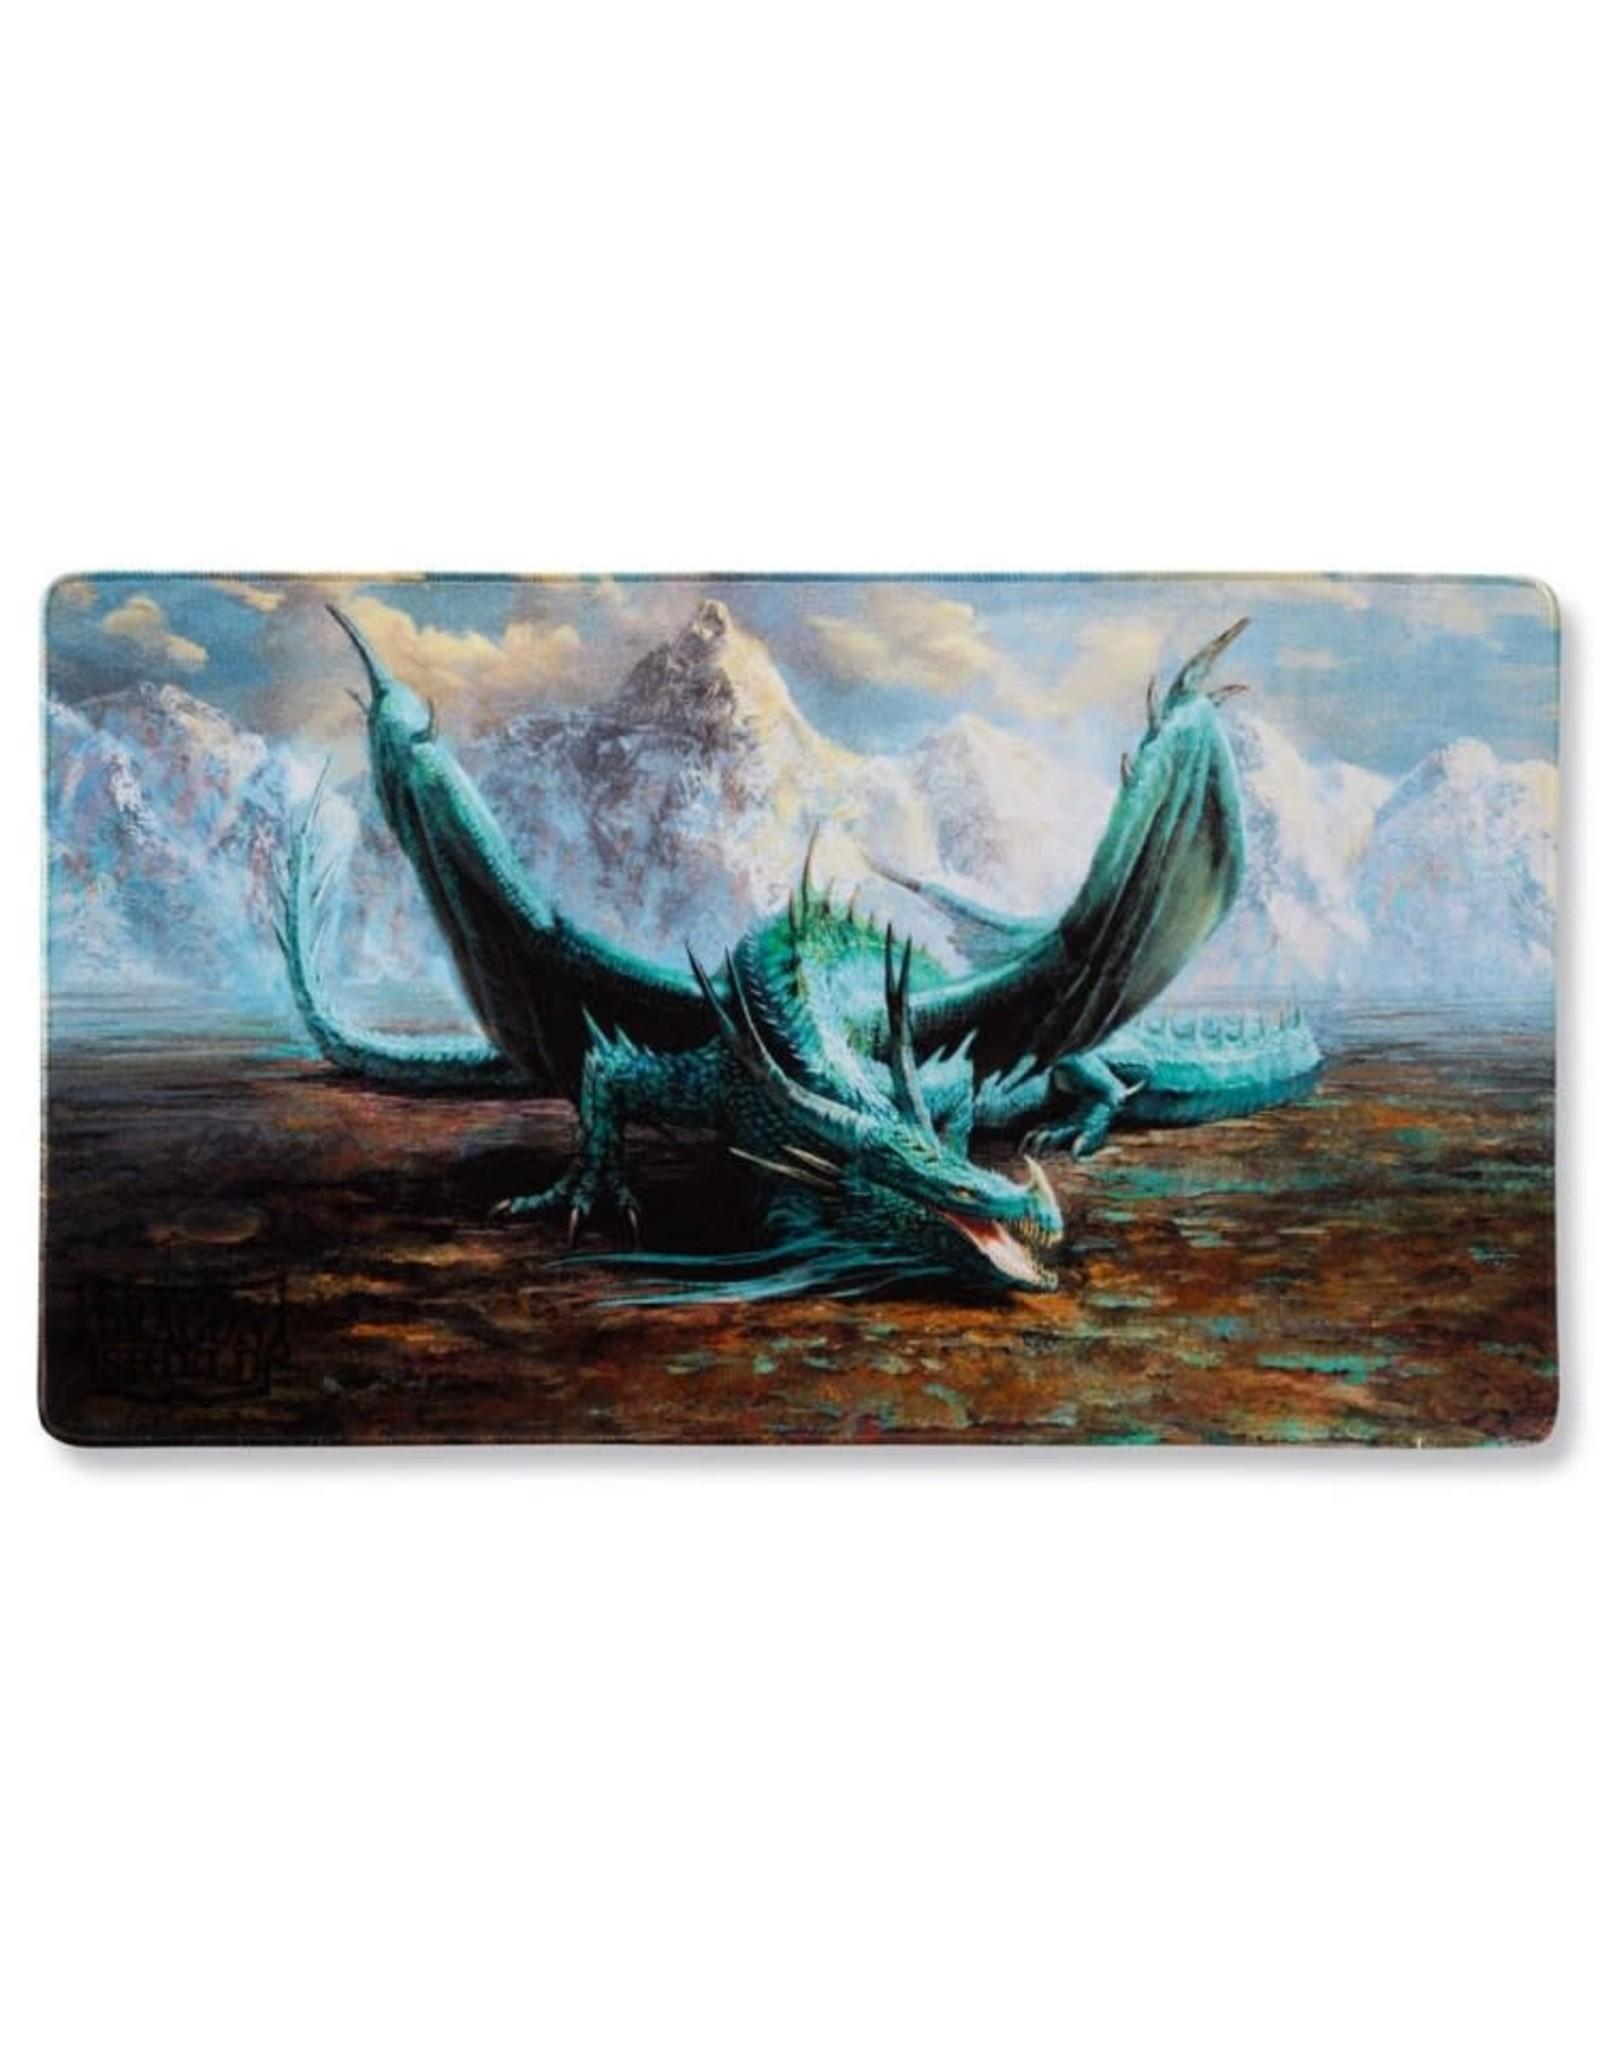 Dragon Shield Playmat: Dragon Shield - Art Cor Mint